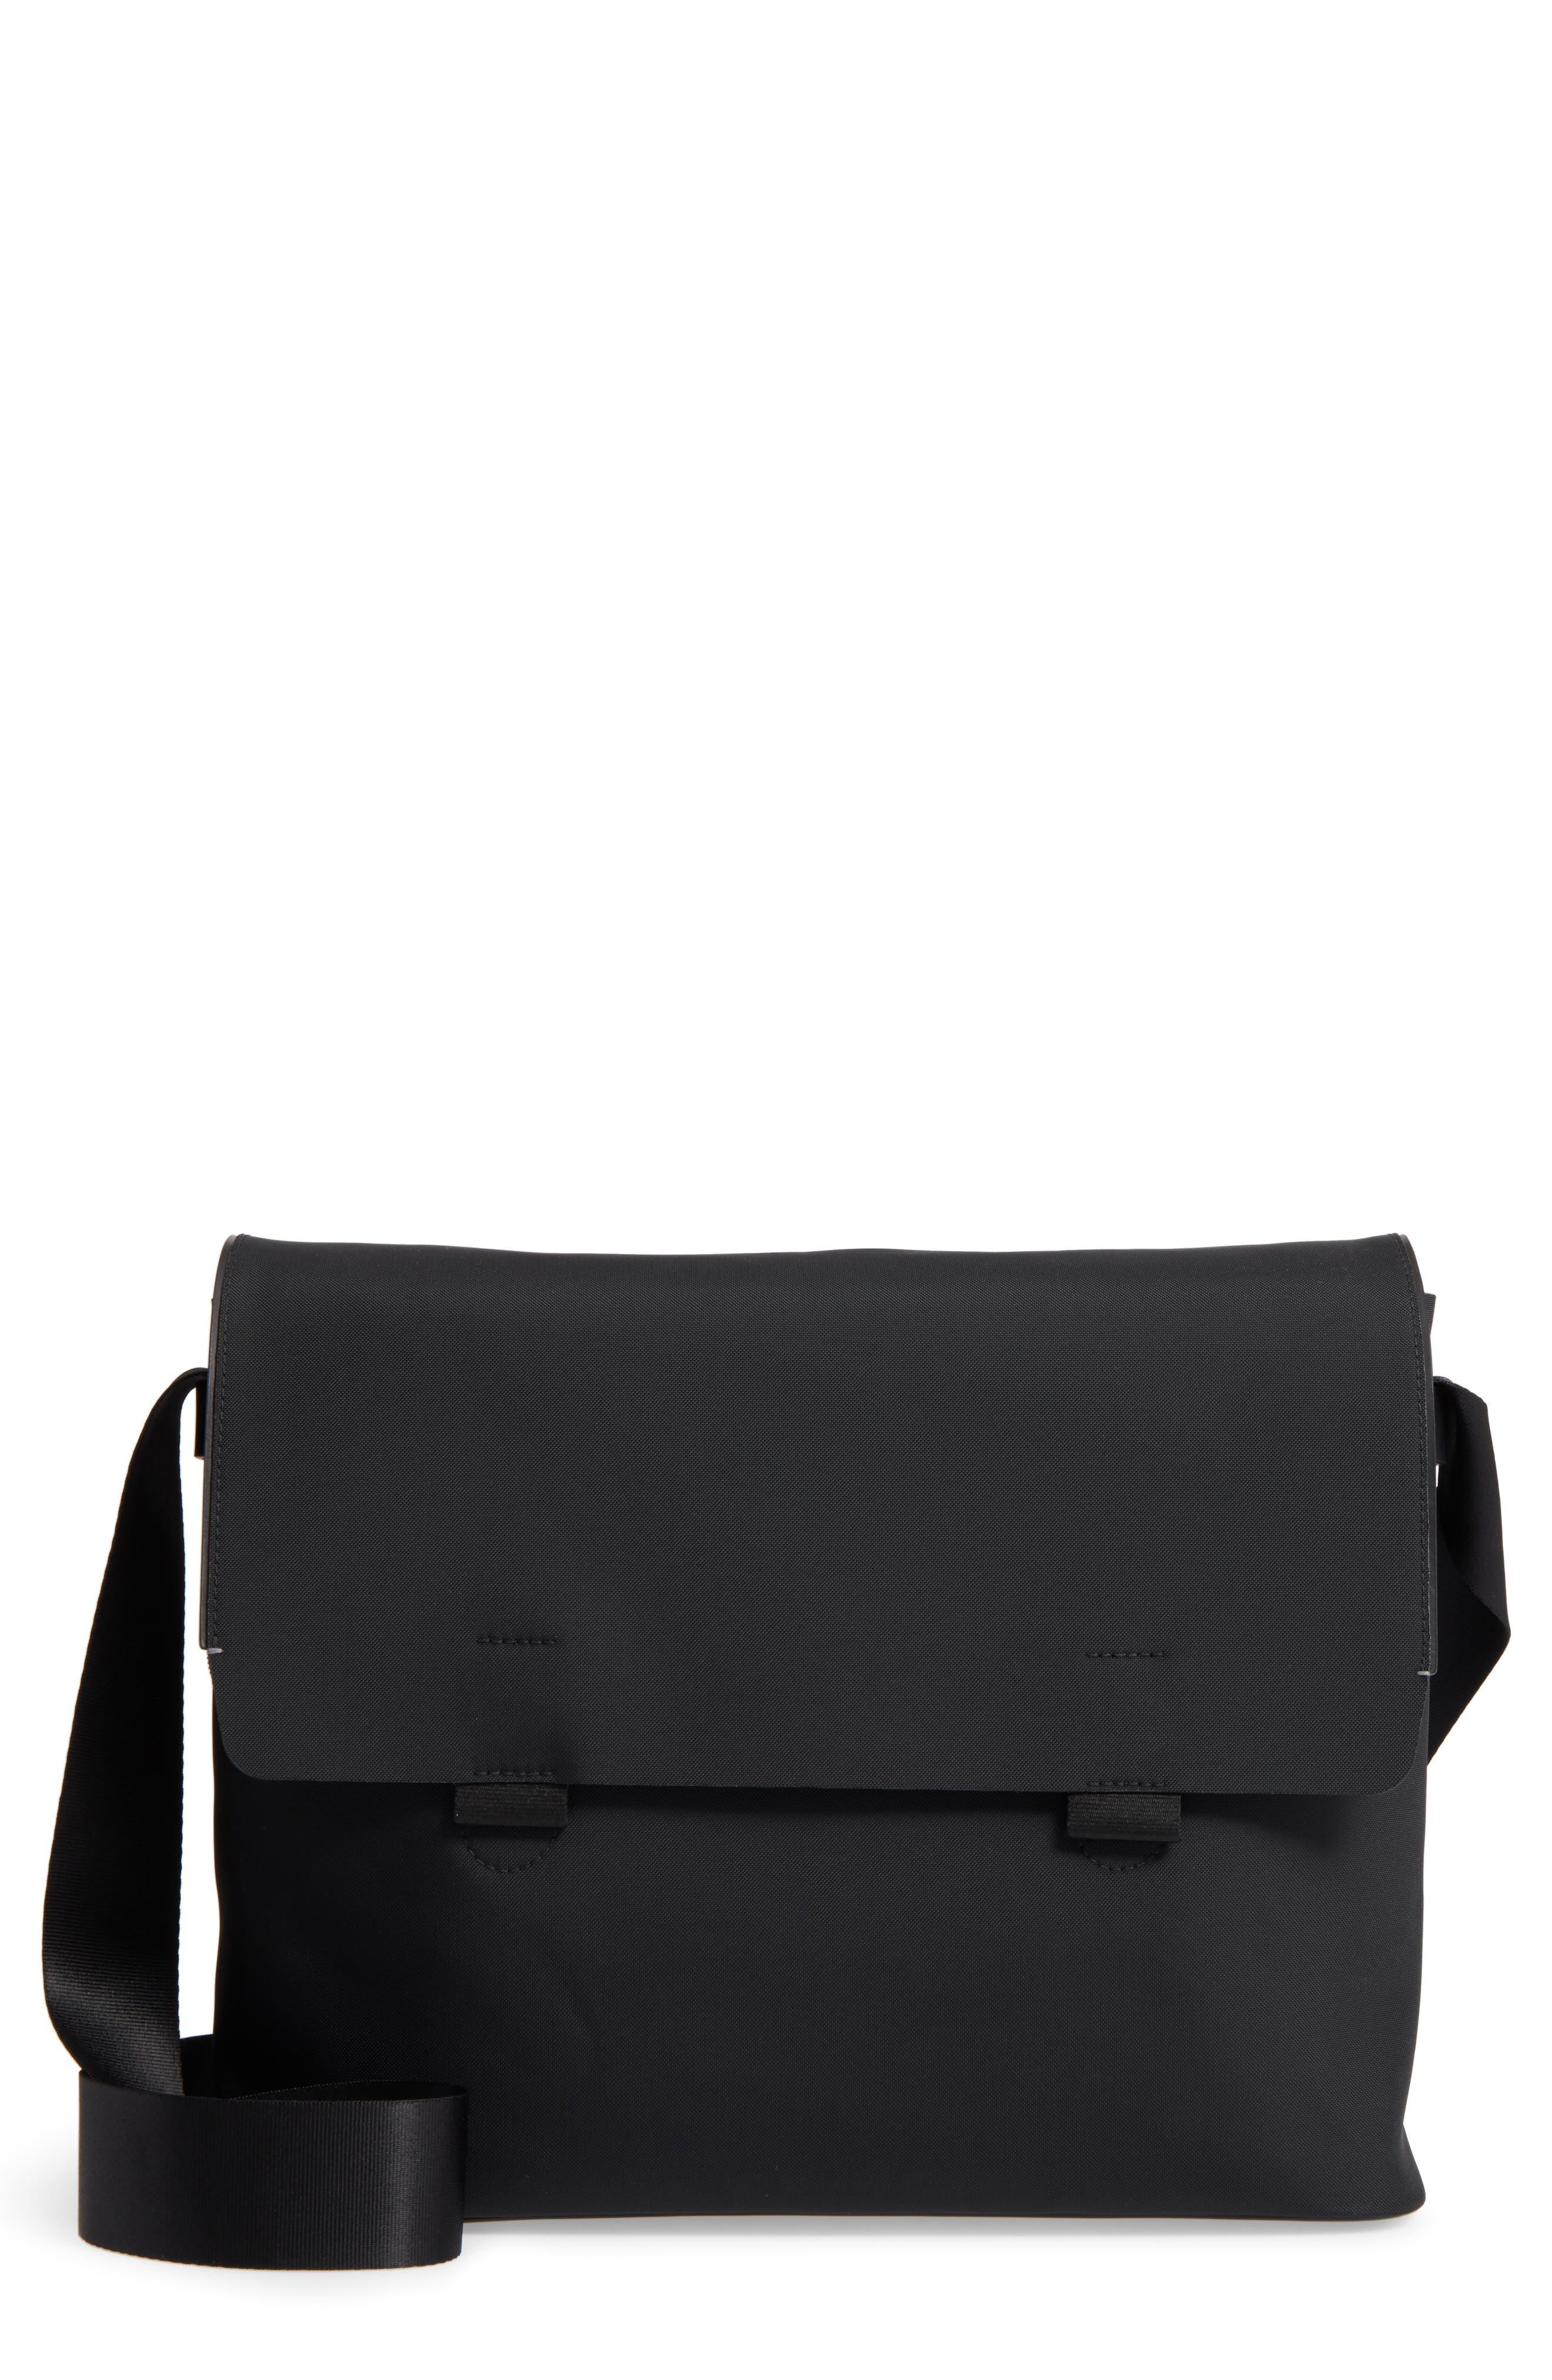 TROUBADOUR Nylon & Leather Messenger Bag